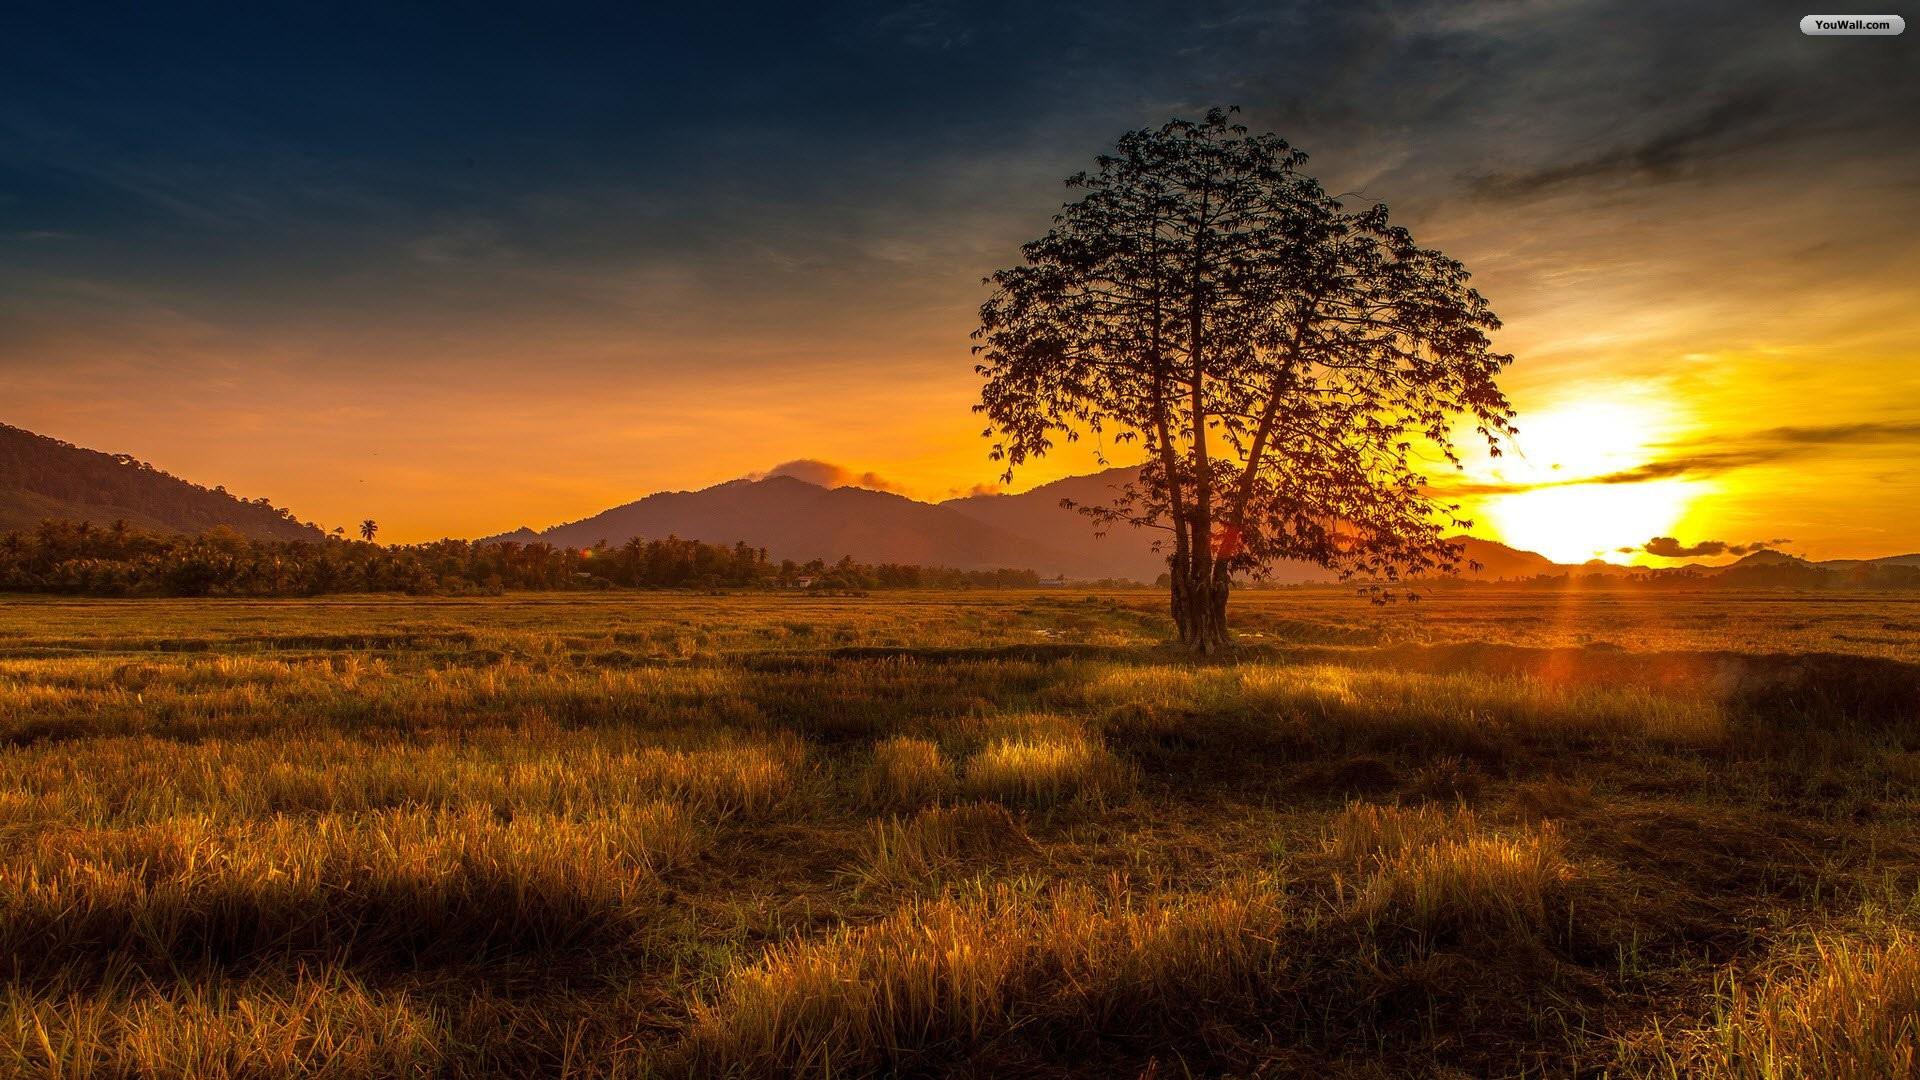 1920x1080 Beautiful Sunset Wallpaper Download